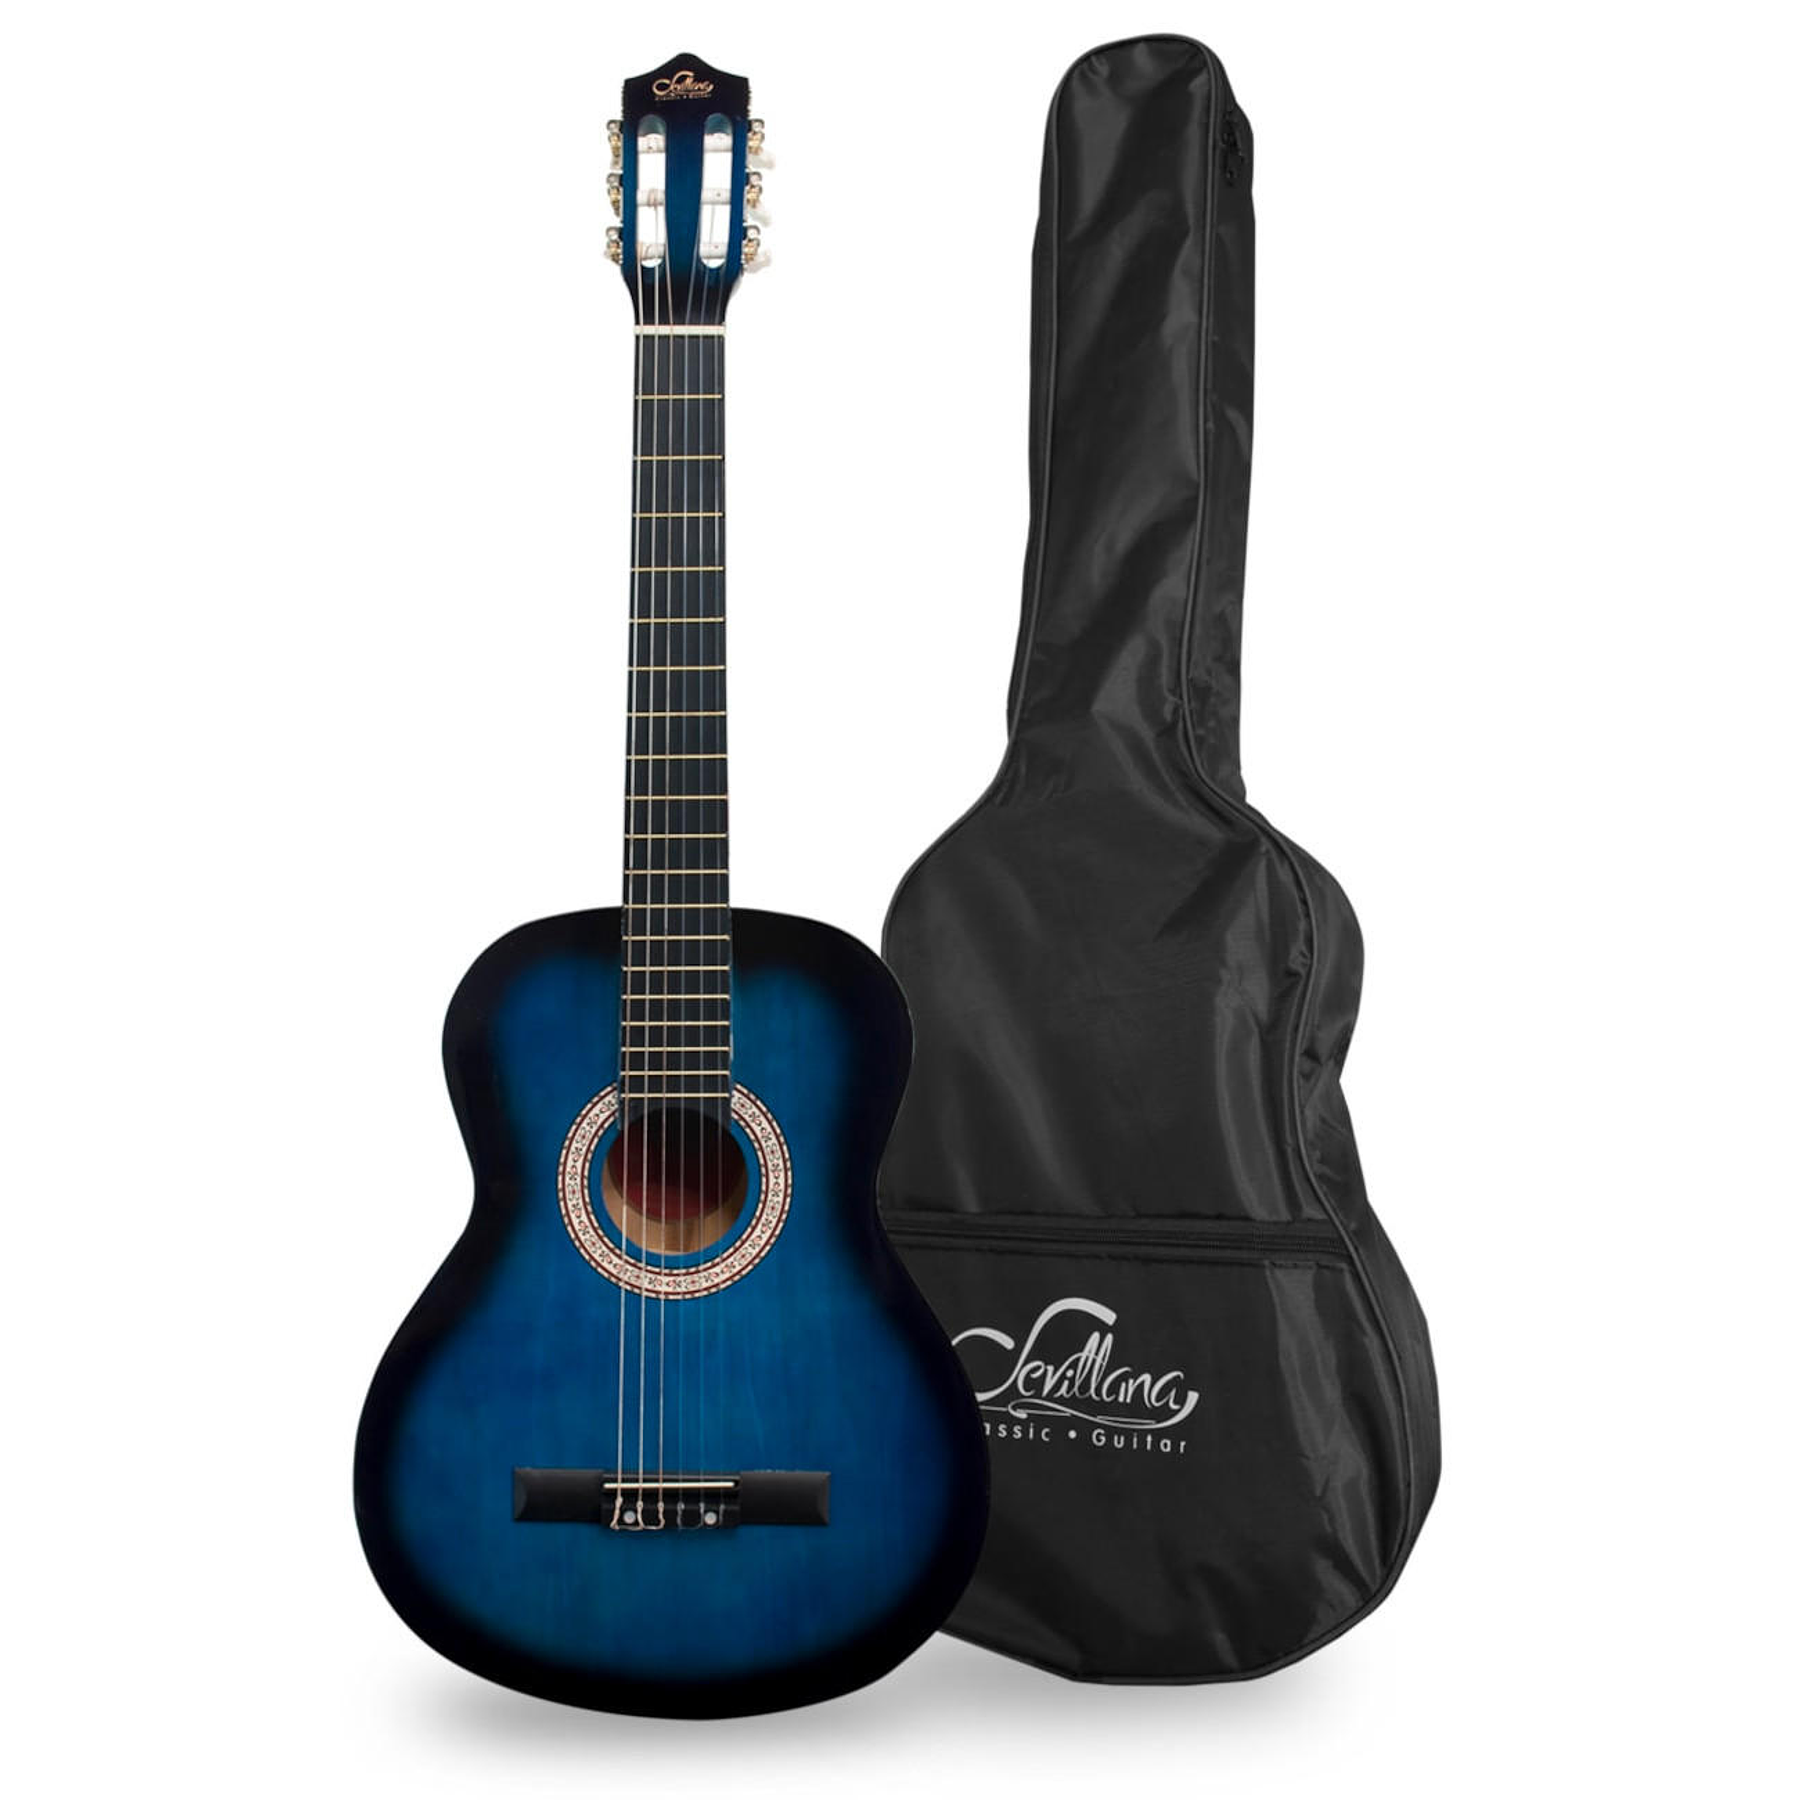 Guitarra Acustica 39'' Sevillana 08449 Blueburst